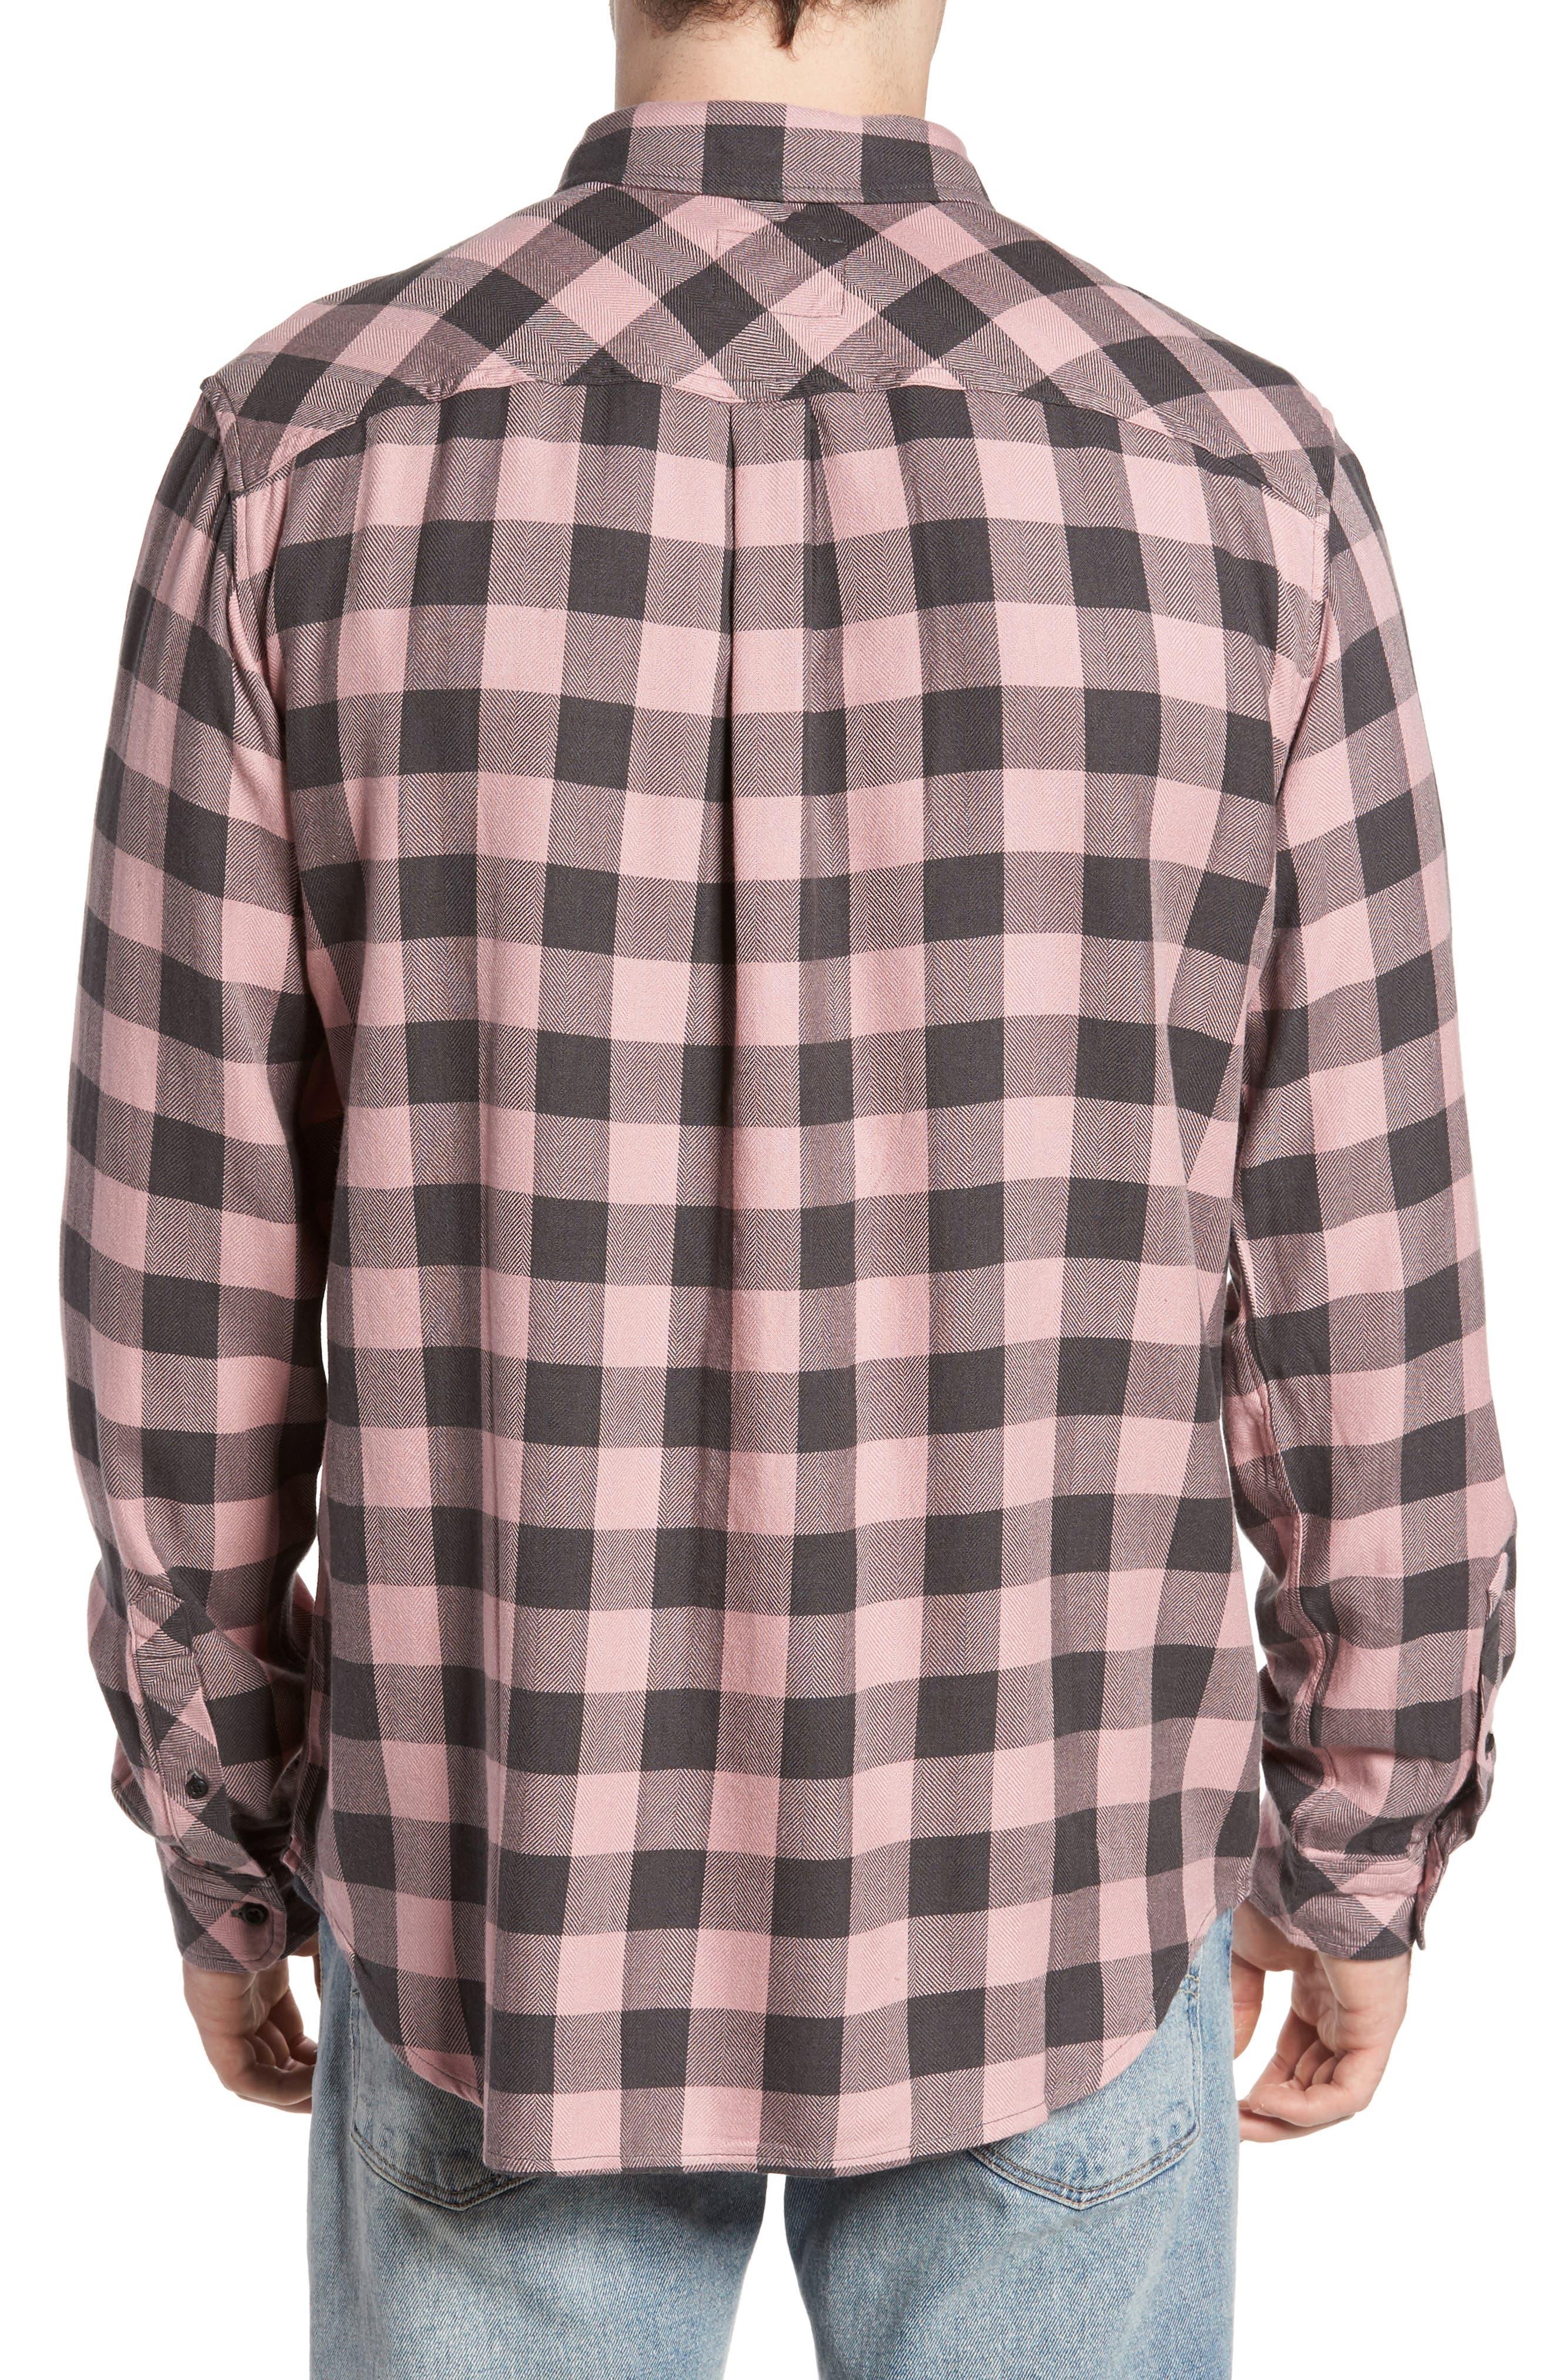 Lennox Sport Shirt,                             Alternate thumbnail 2, color,                             Pale Pink/ Charcoal